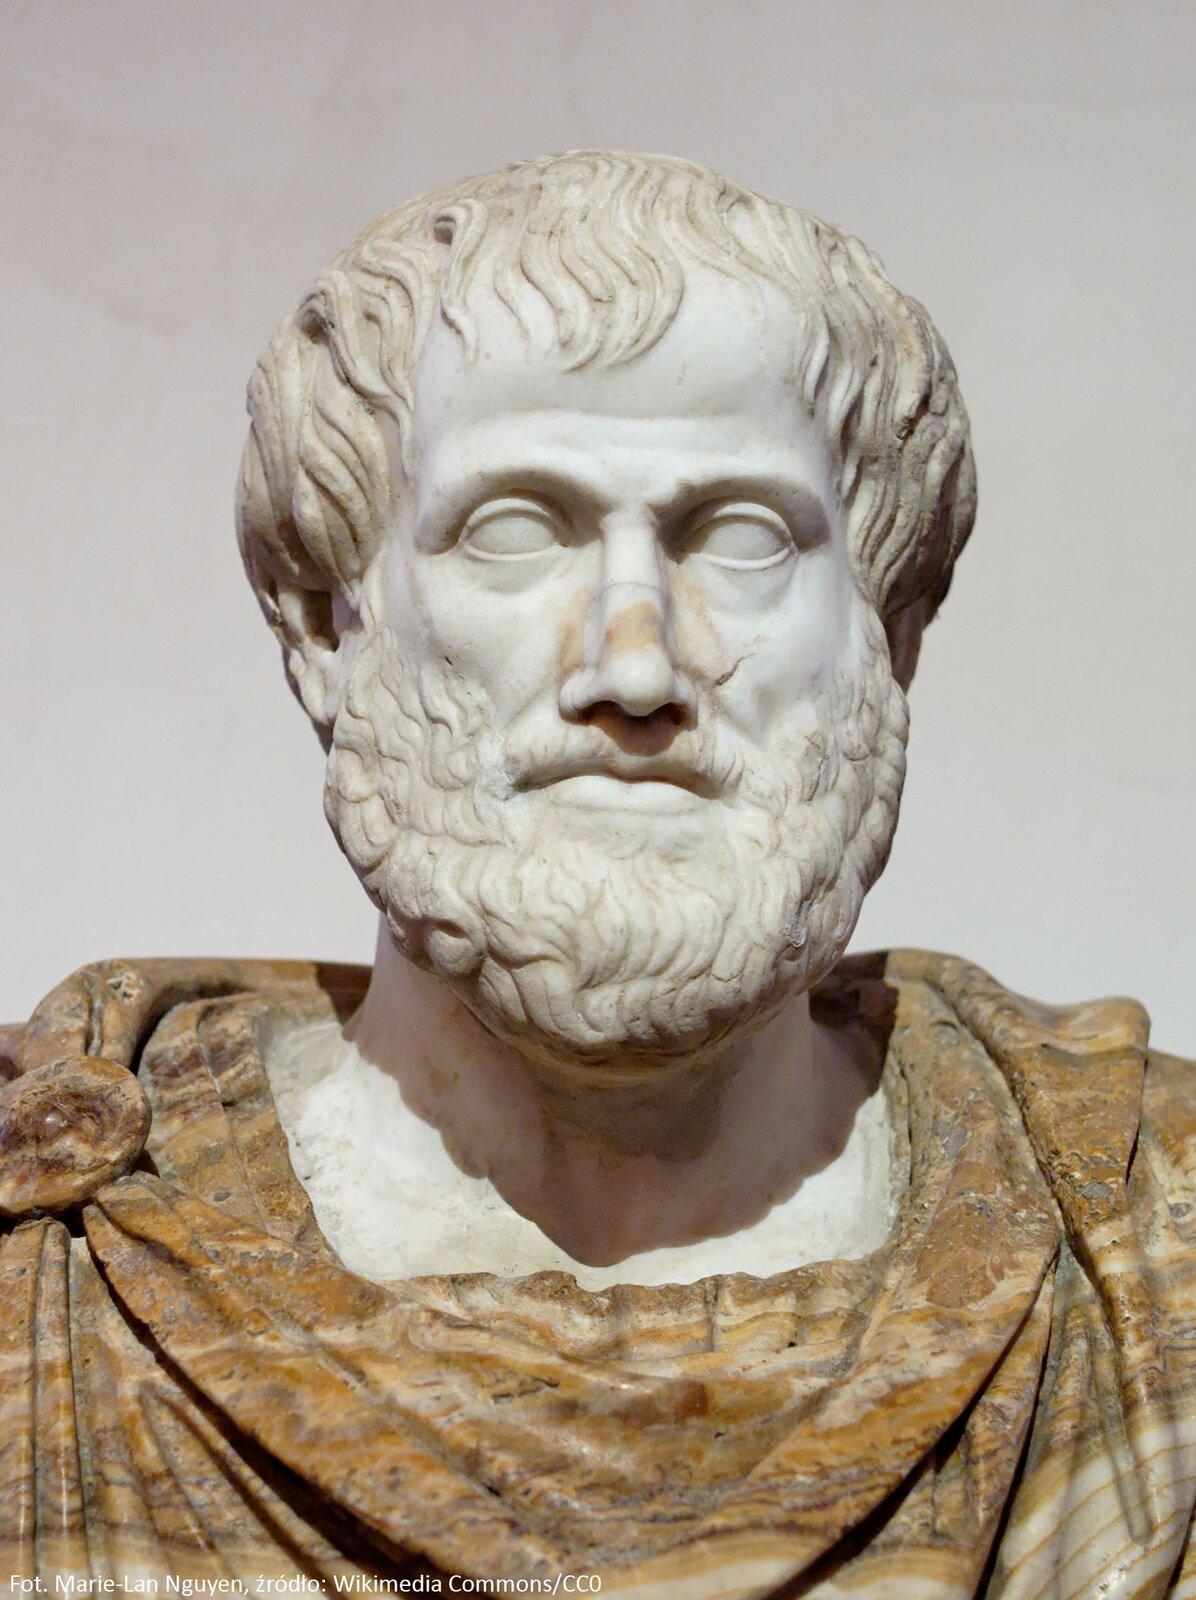 Arystoteles Źródło: licencja: CC 0.